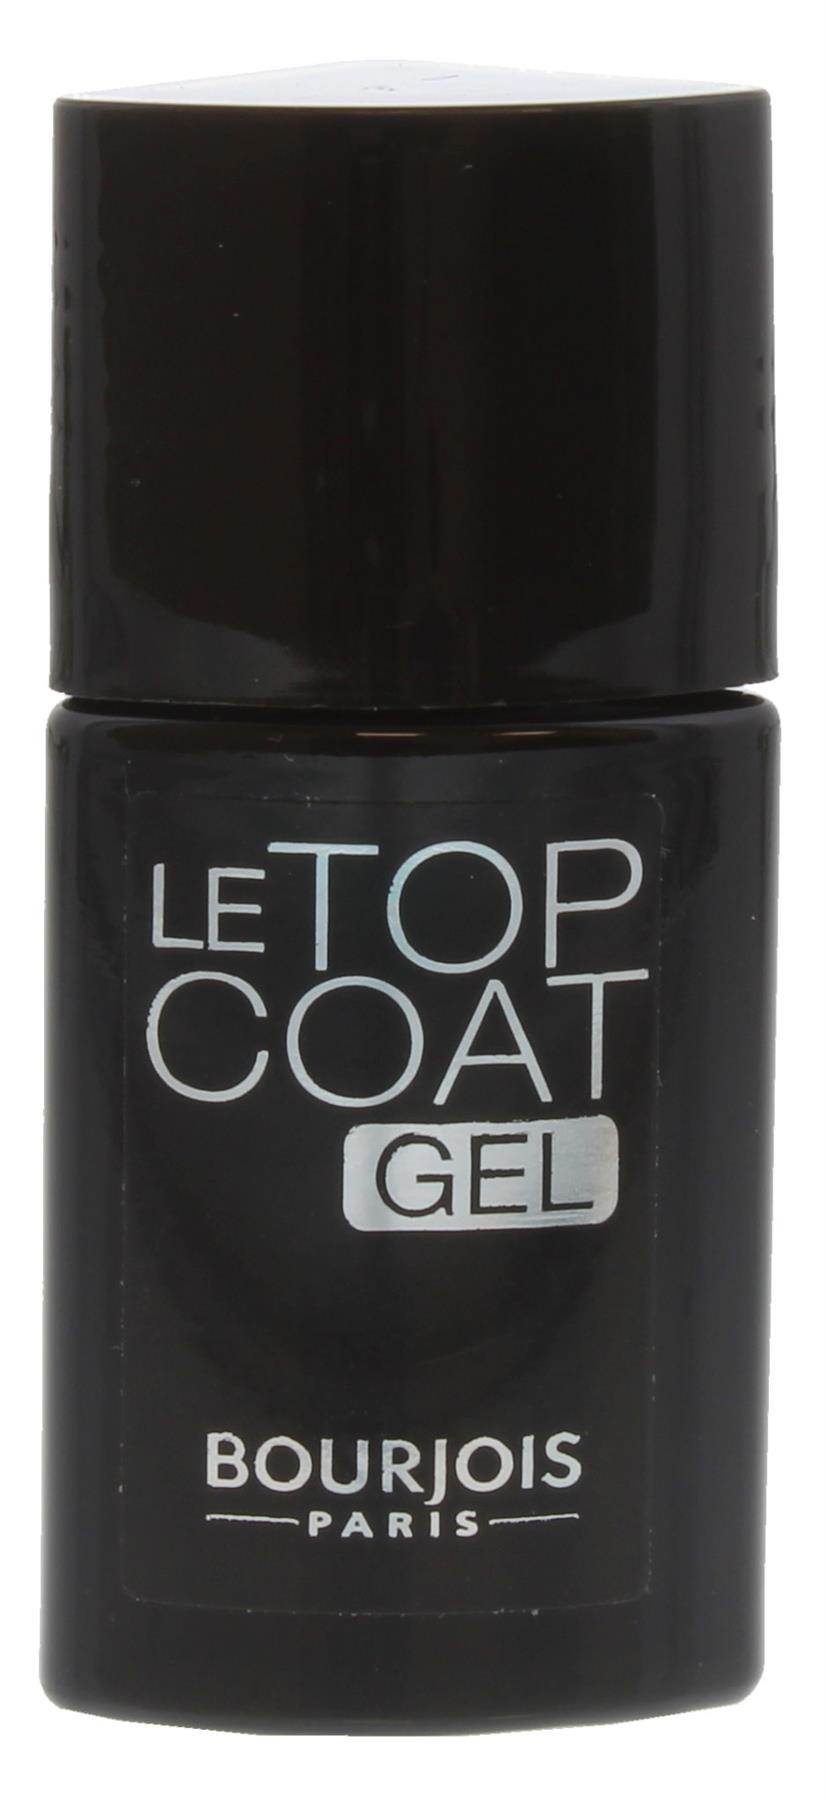 Bourjois-la-Laque-Gel-NO-UV-Polish-Nail-Gelly-Paint-Nails-Varnish-10ml-Bundle thumbnail 21